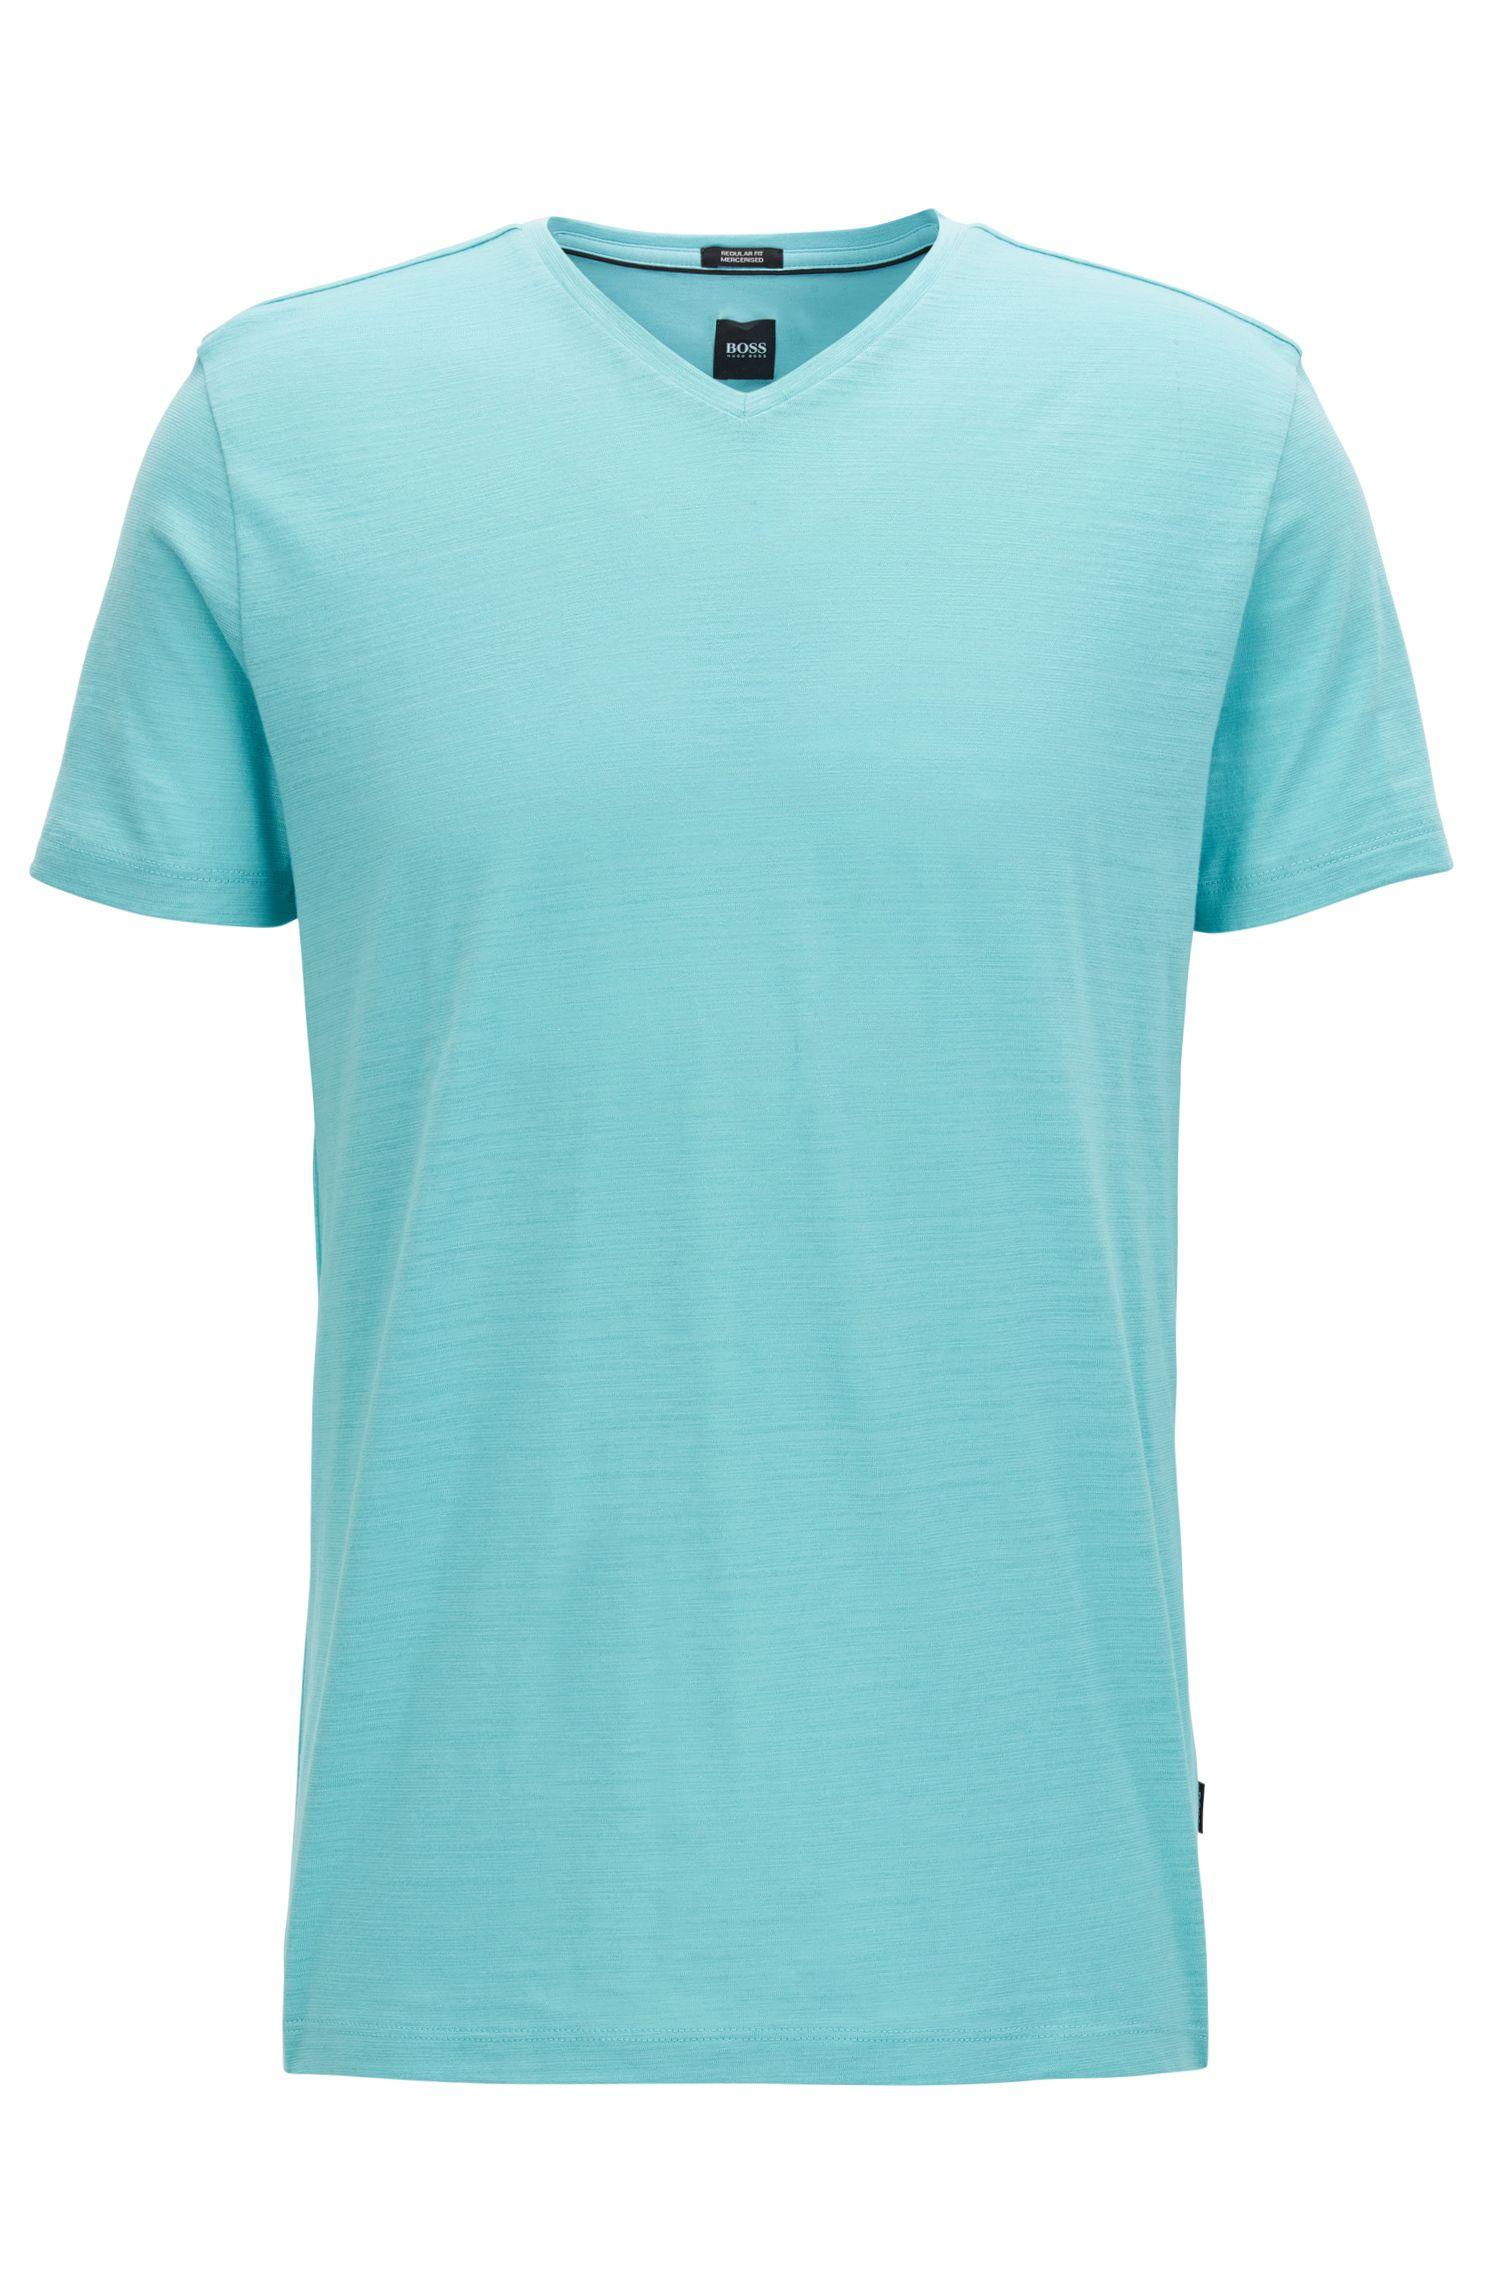 Camiseta regular fit en algodón mercerizado